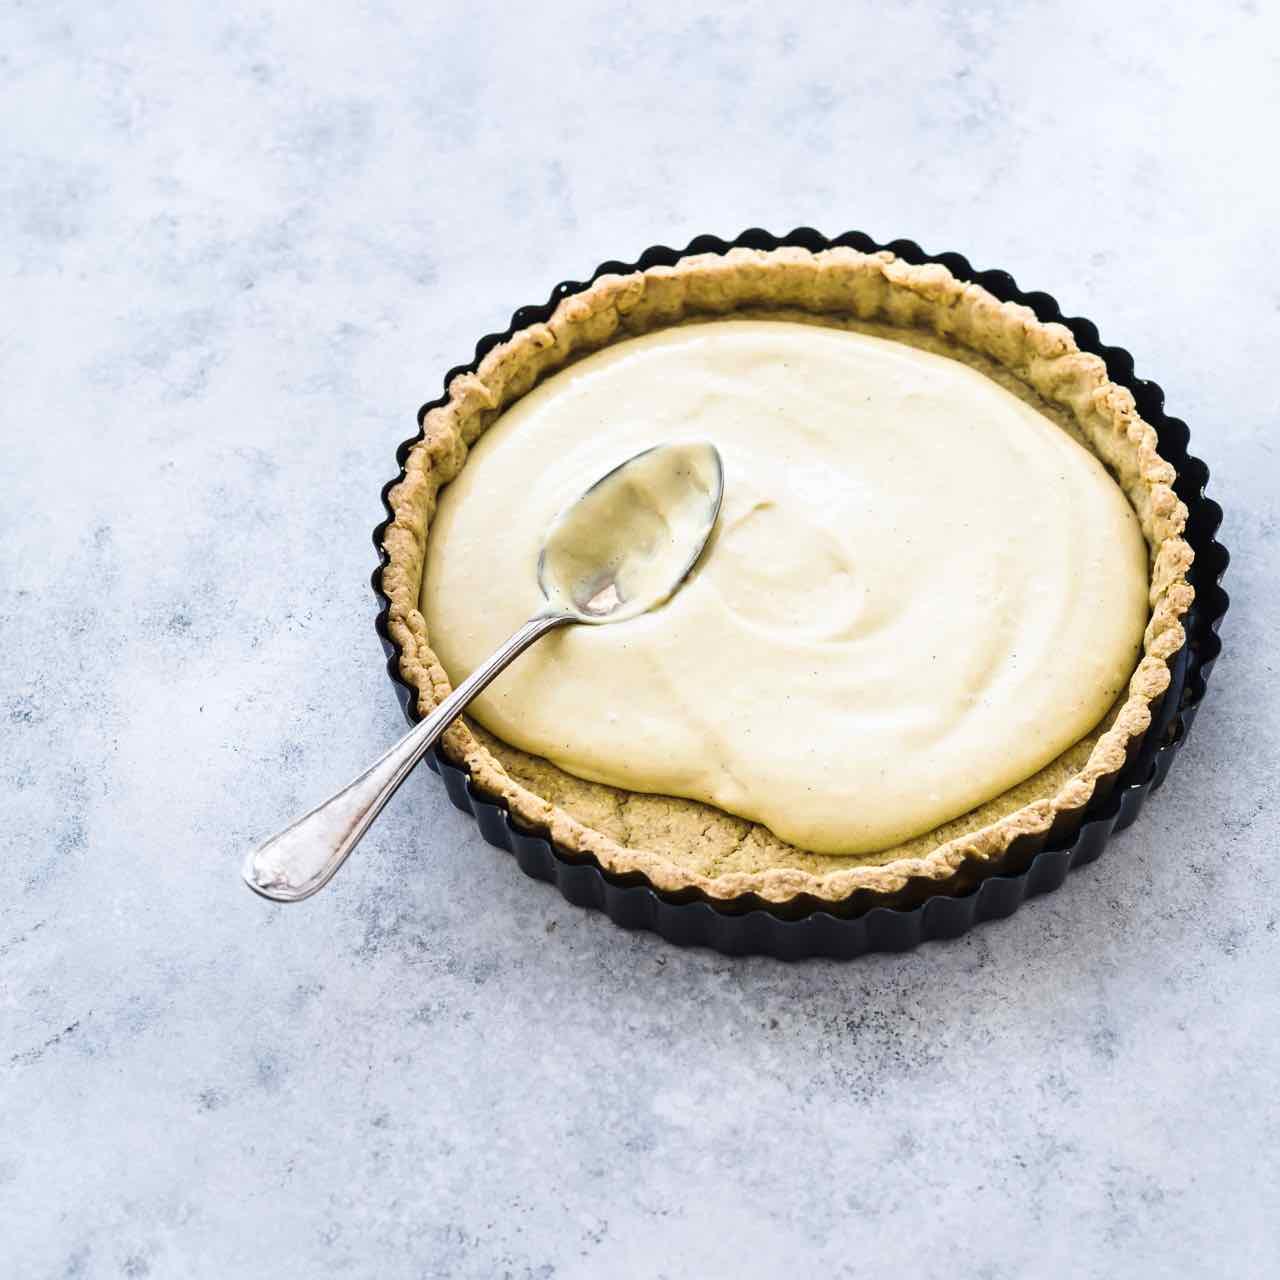 crema pasticcera al miele - HONEY CUSTARD CREAM - RICETTA crema pasticcera - RICETTA crema pasticcera al miele - - COME FARE LA crema pasticcera - how to make honey custard cream - OPSD BLOG - SONIA MONAGHEDDU - FOOD PHOTOGRAPHY - FOOD STYLING